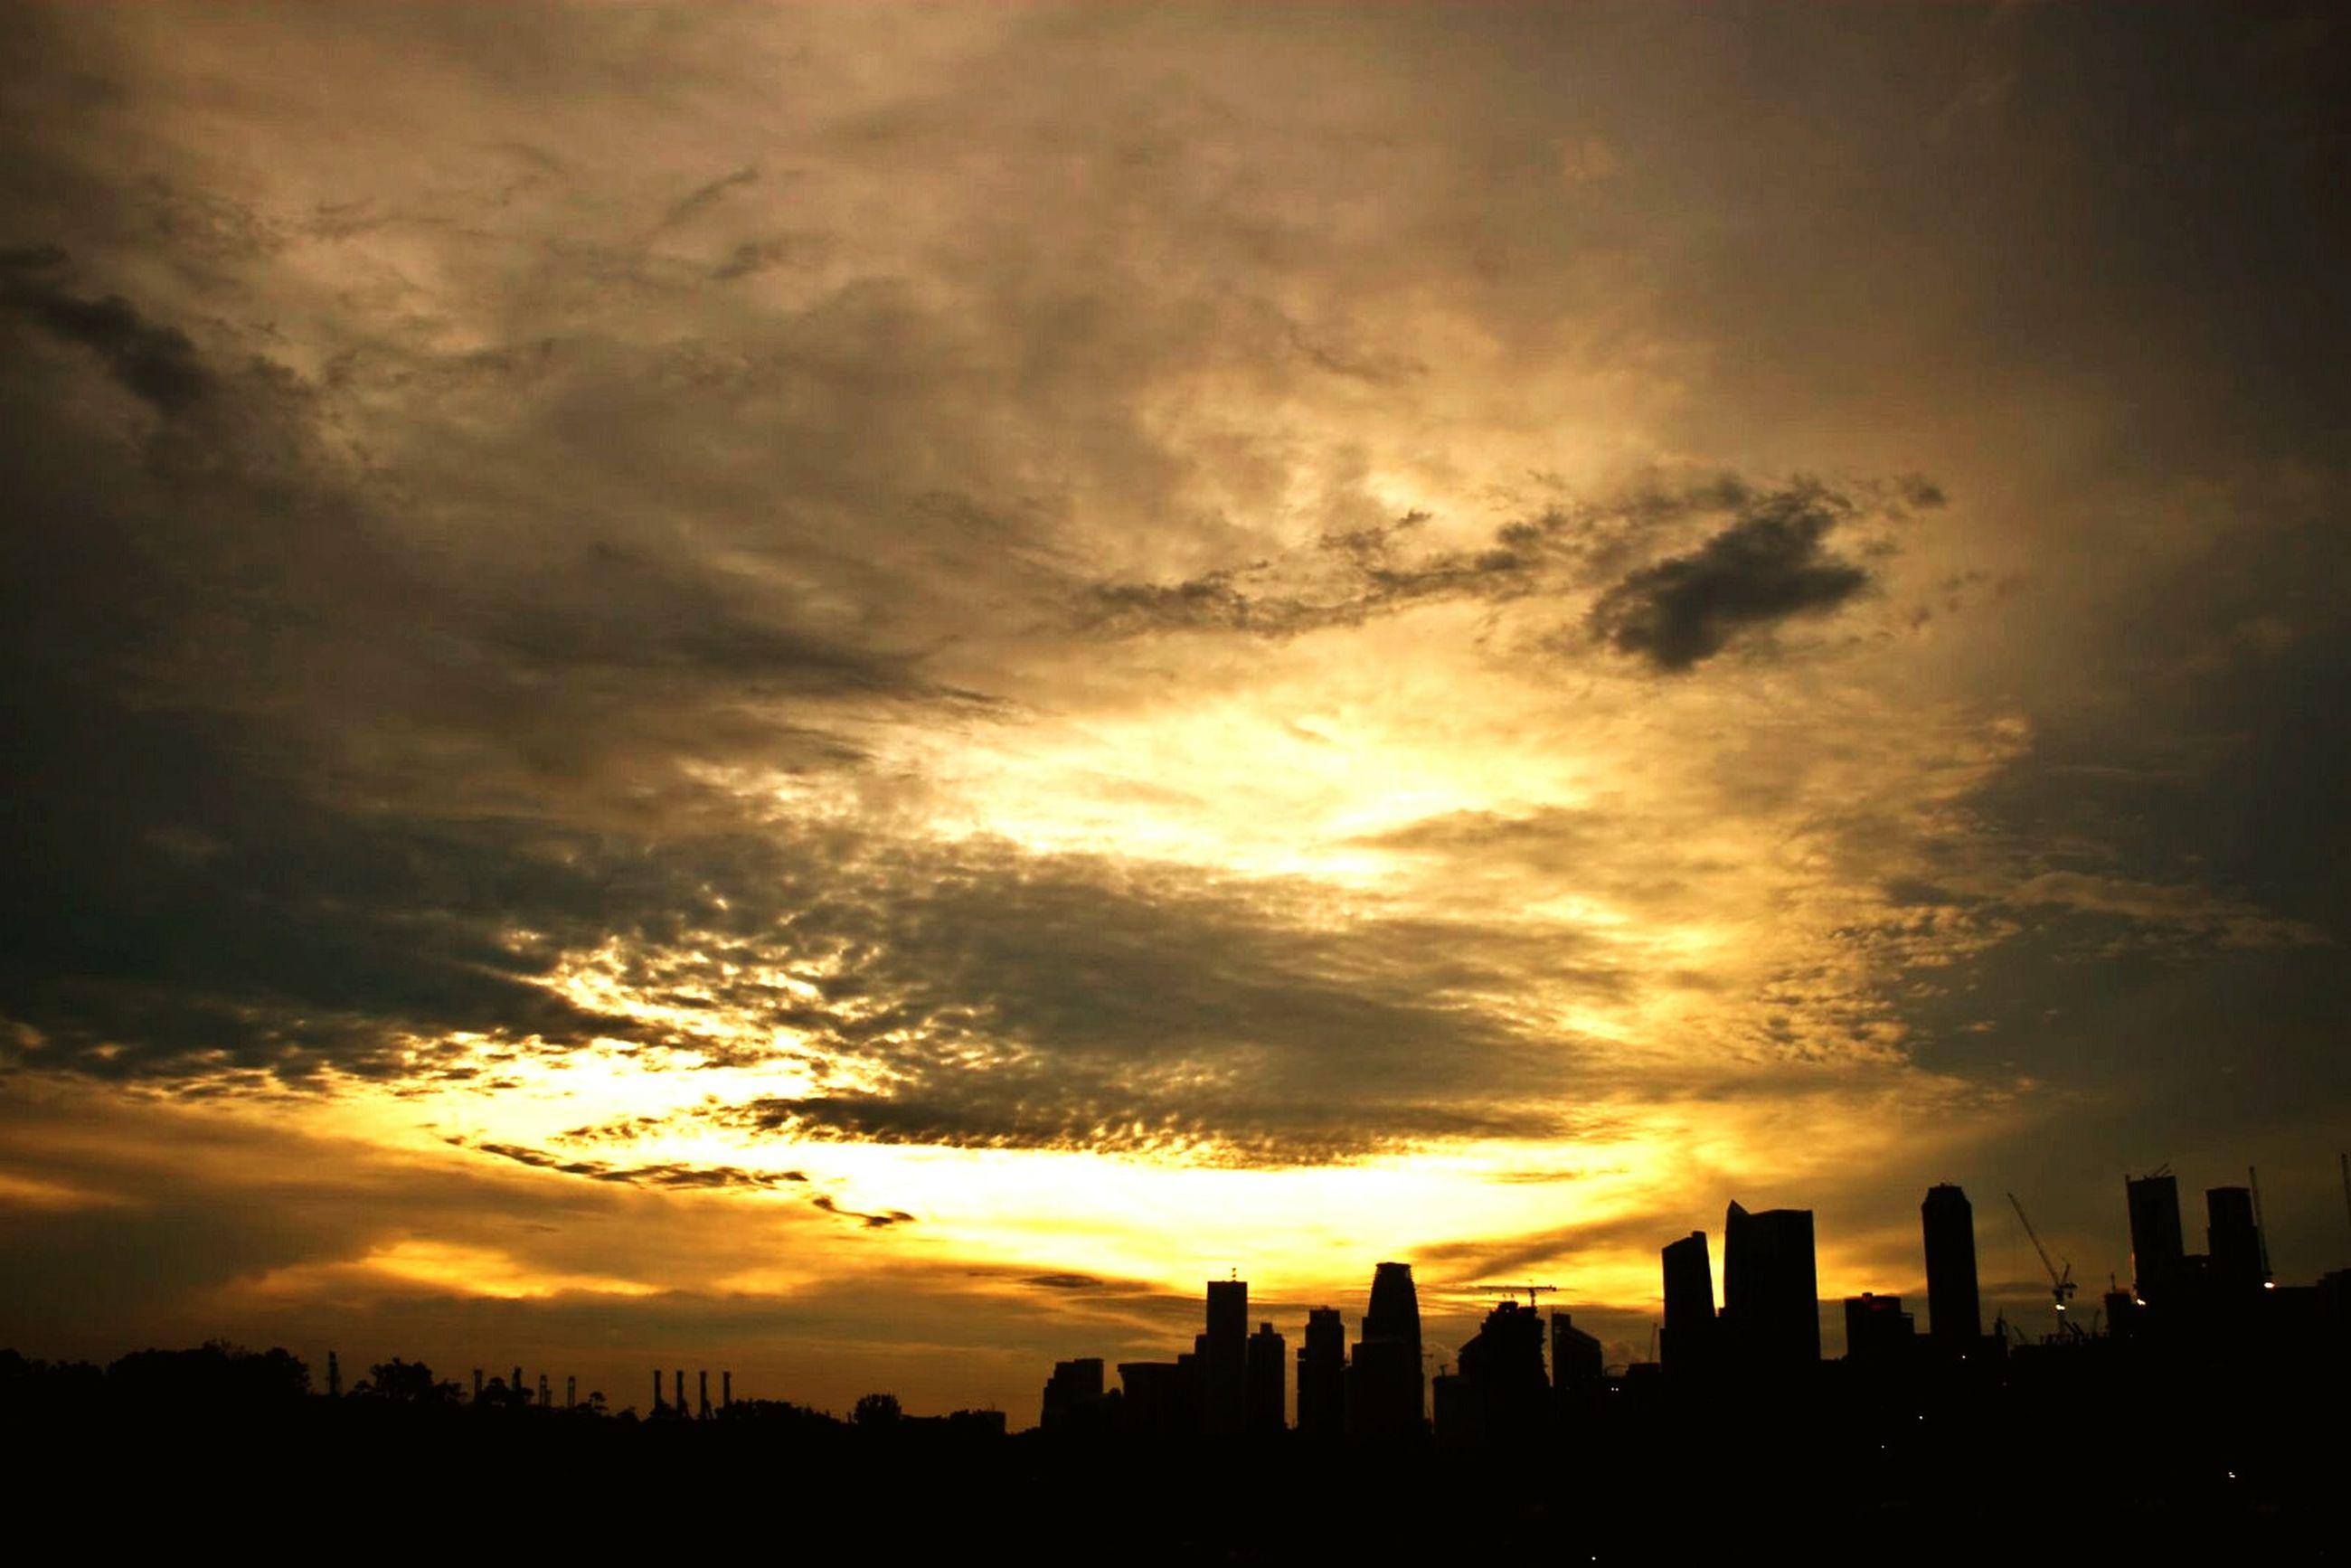 sunset, silhouette, sky, building exterior, architecture, orange color, built structure, city, cloud - sky, scenics, beauty in nature, cityscape, outline, nature, dramatic sky, cloud, skyscraper, tranquil scene, urban skyline, idyllic